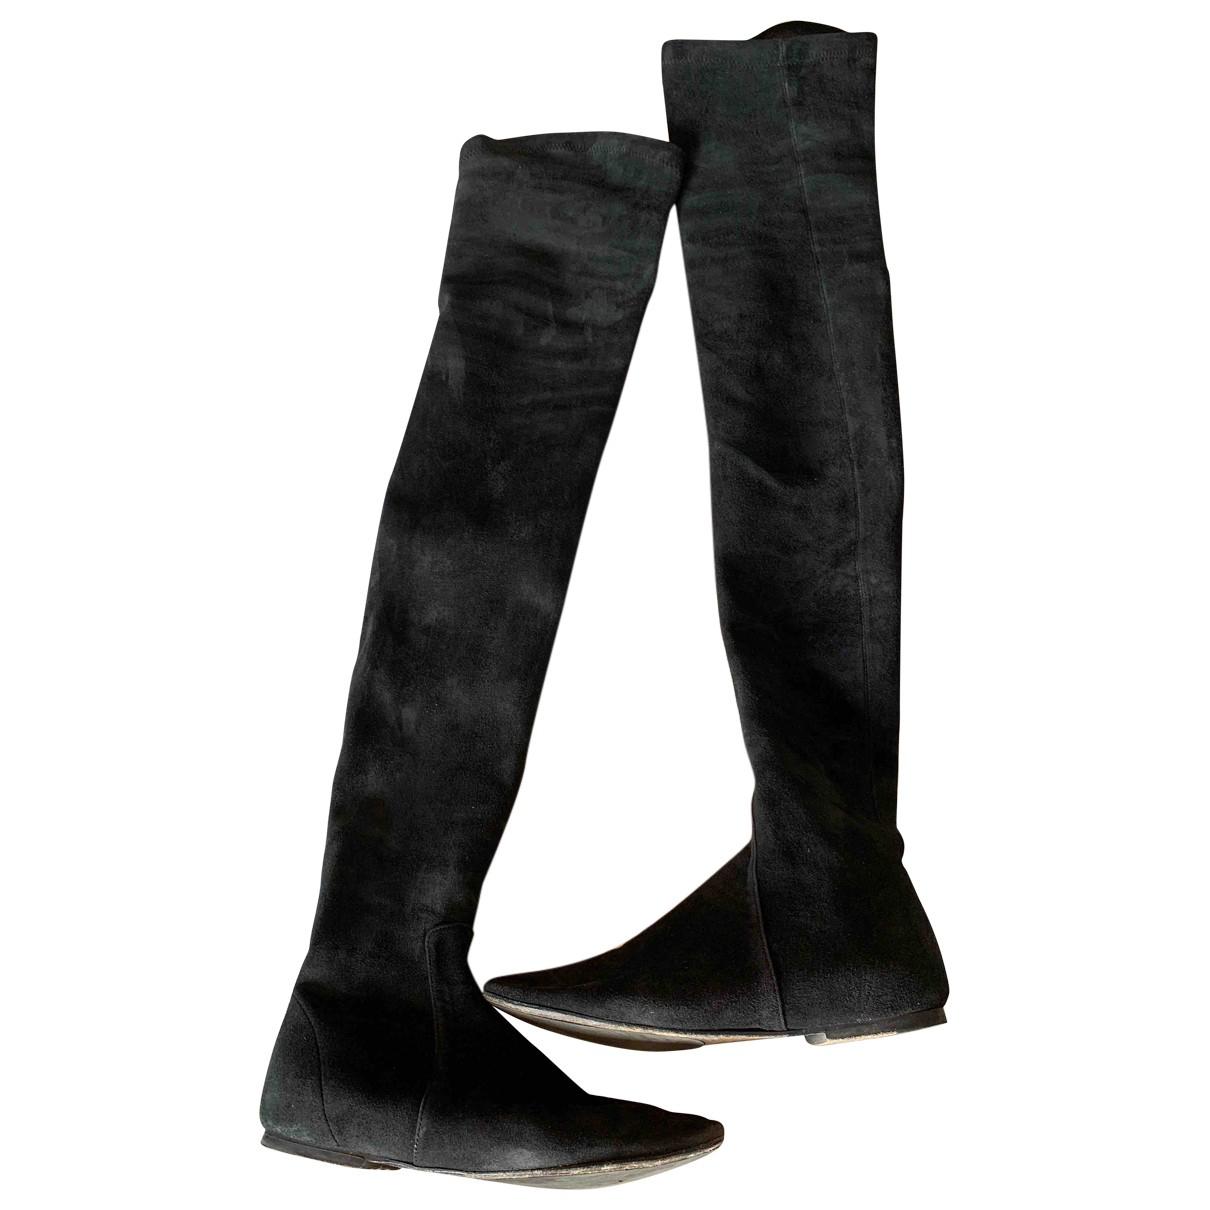 Isabel Marant N Black Suede Boots for Women 37 EU